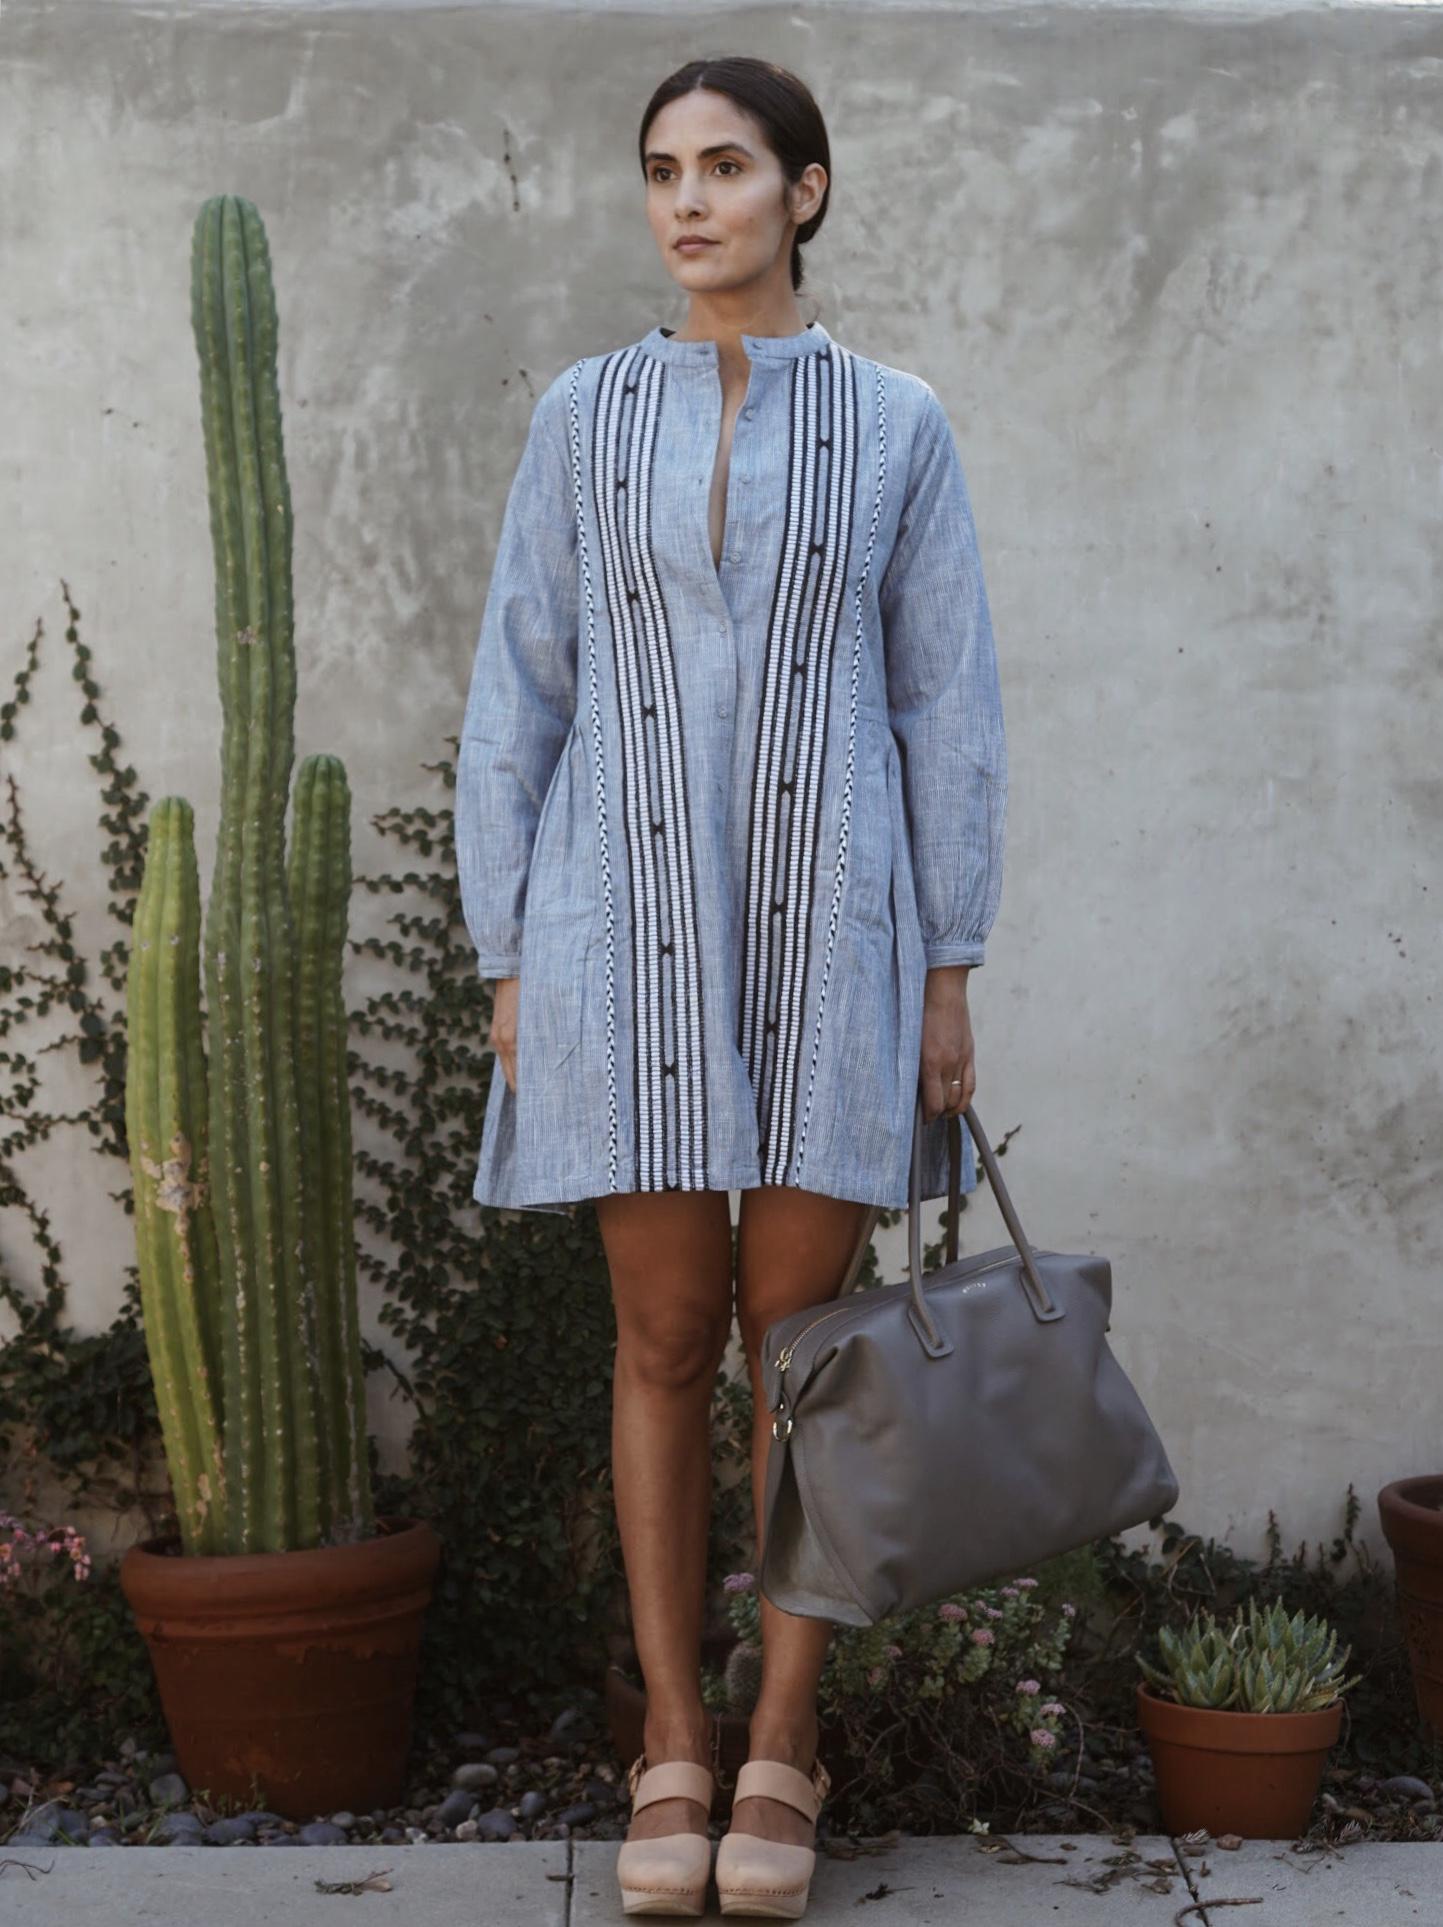 Kopal  Riya Dress in Indigo Stripe +  Maiyet Como Large Satchel in Grey +   Zuzii   Closed Toe Clogs in Natural.